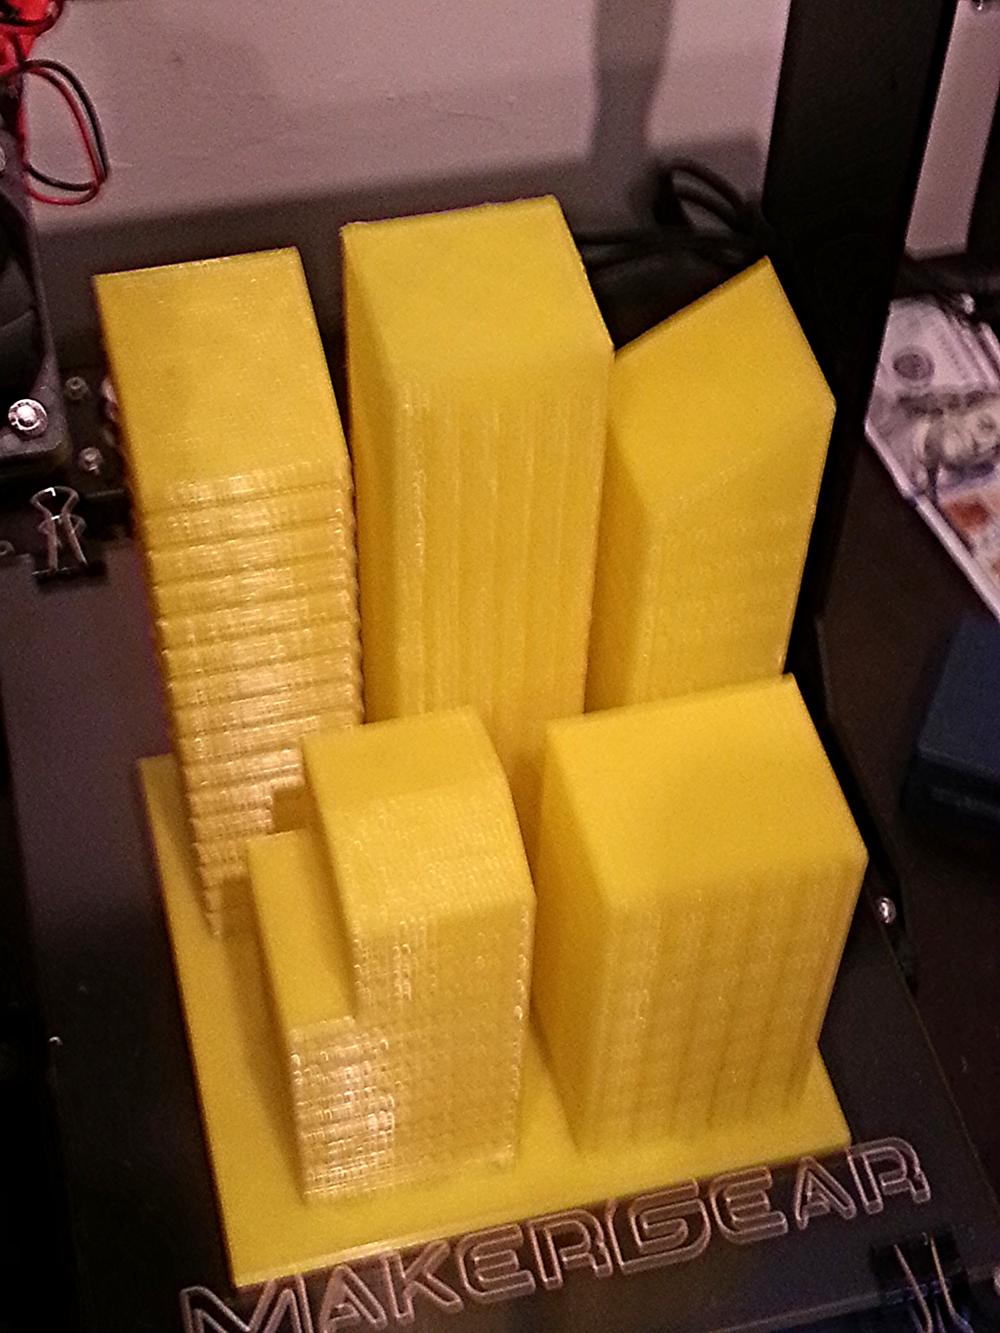 Skyline 4 building model